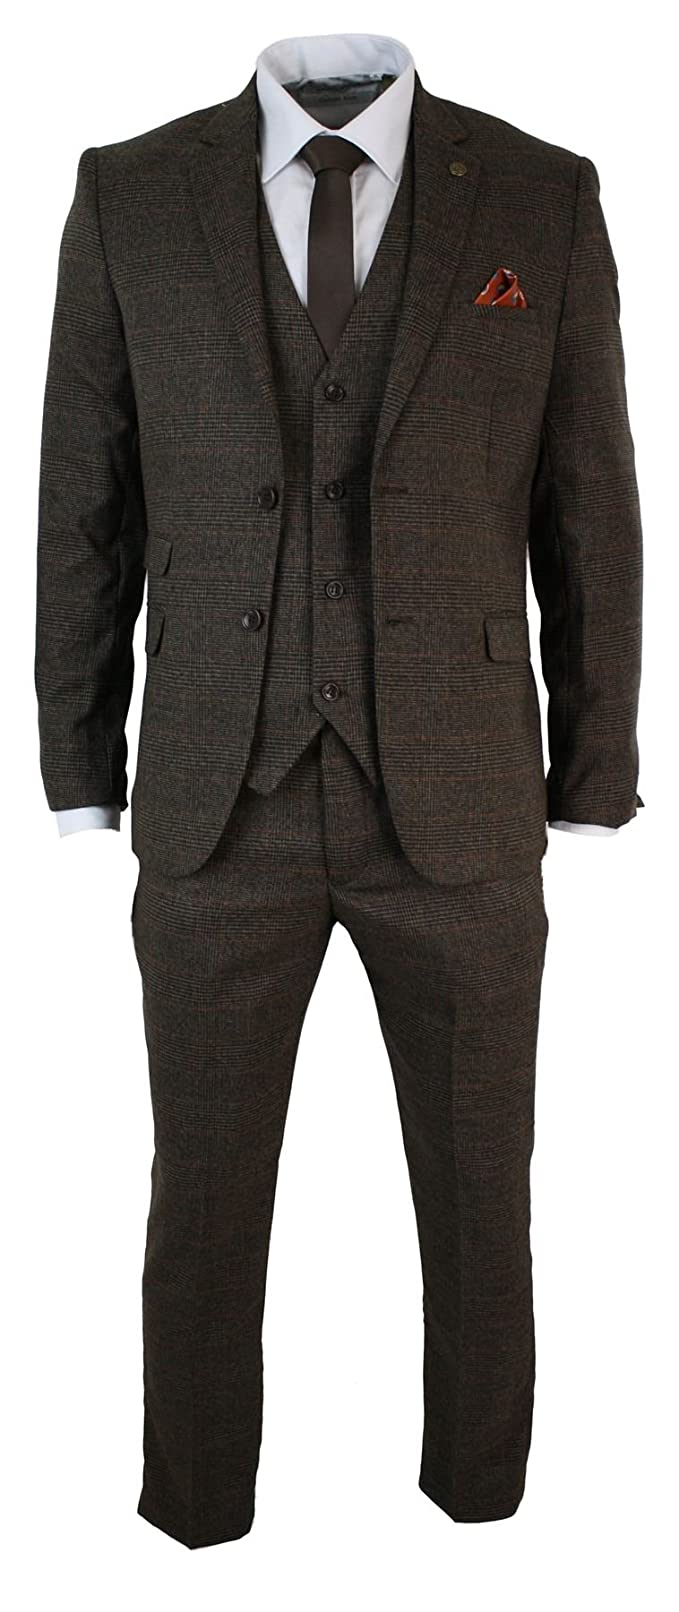 Mens Herringbone Check Trouser Vintage Tweed Slim Fit Smart Formal Pant Tan Grey